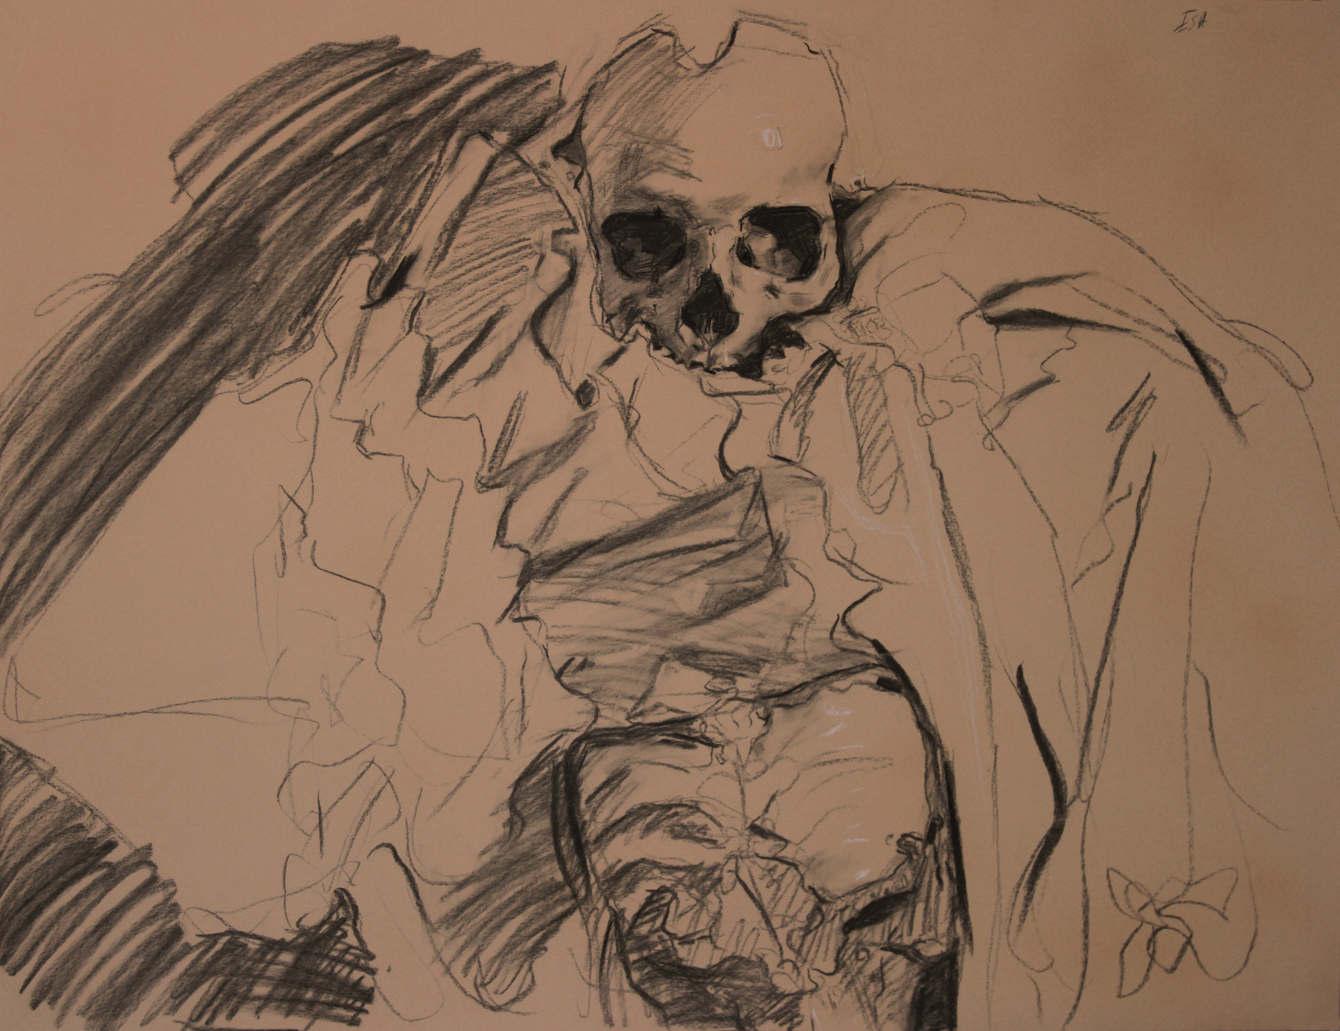 Available Work - The Art of Teresa Oaxaca